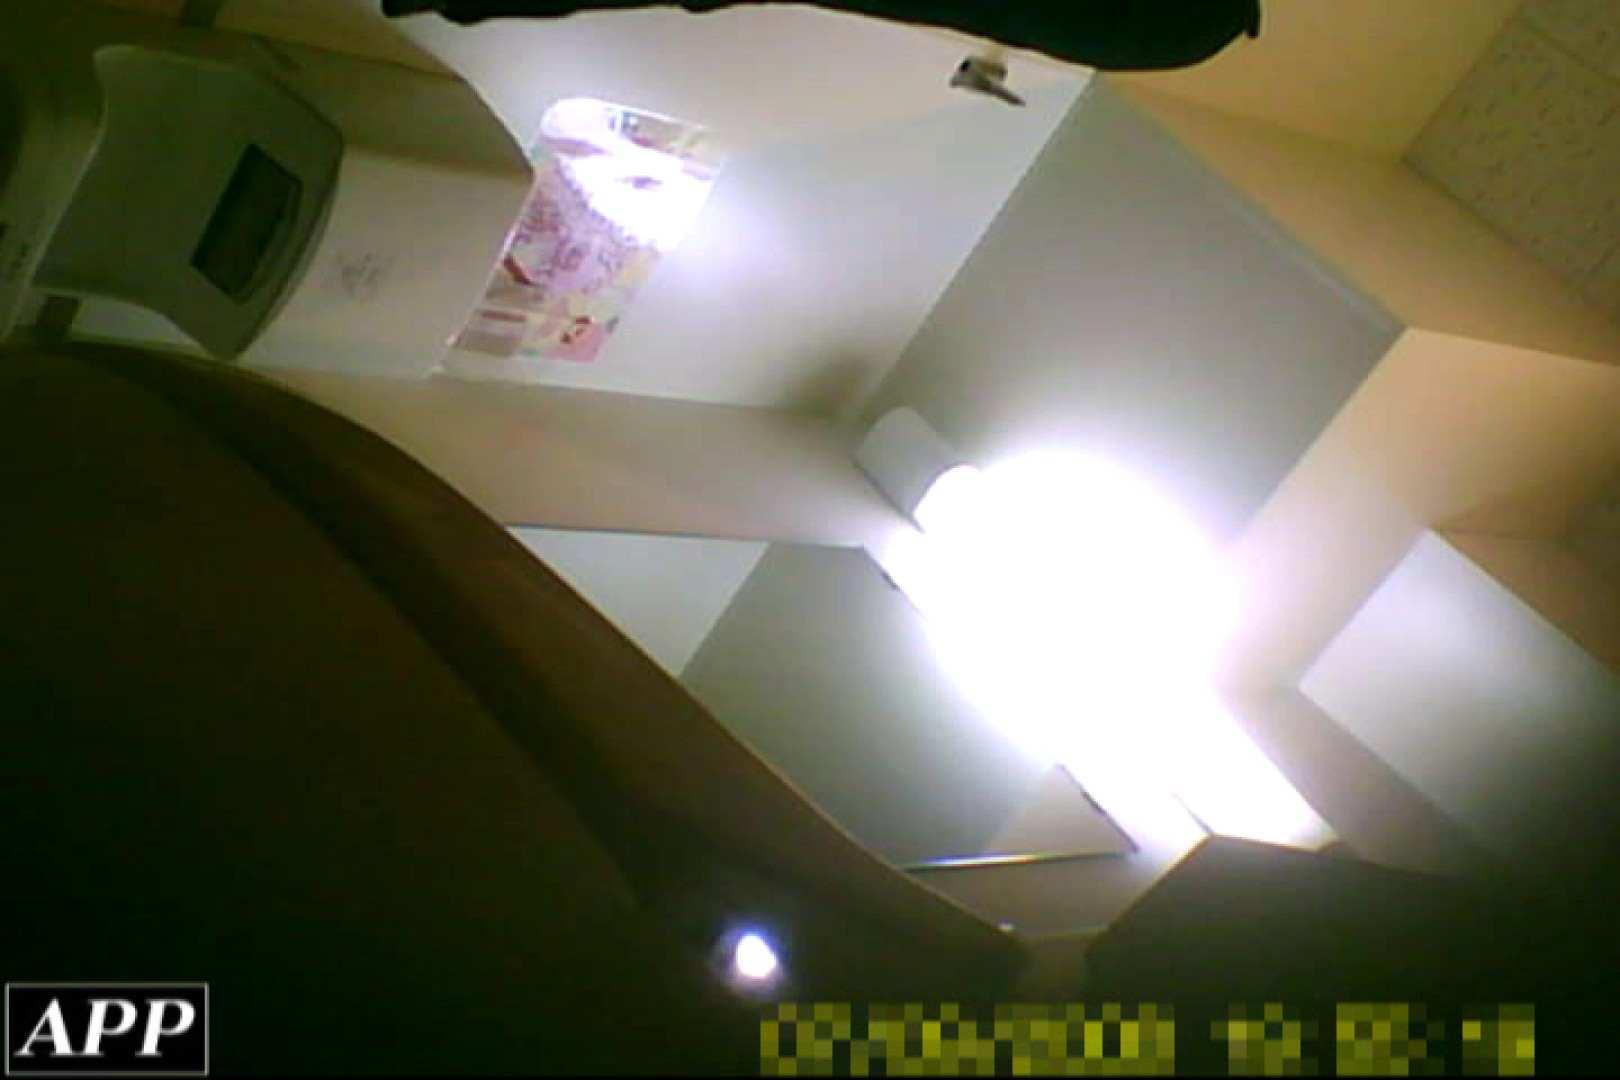 3視点洗面所 vol.133 洗面所 | OLセックス  106画像 37